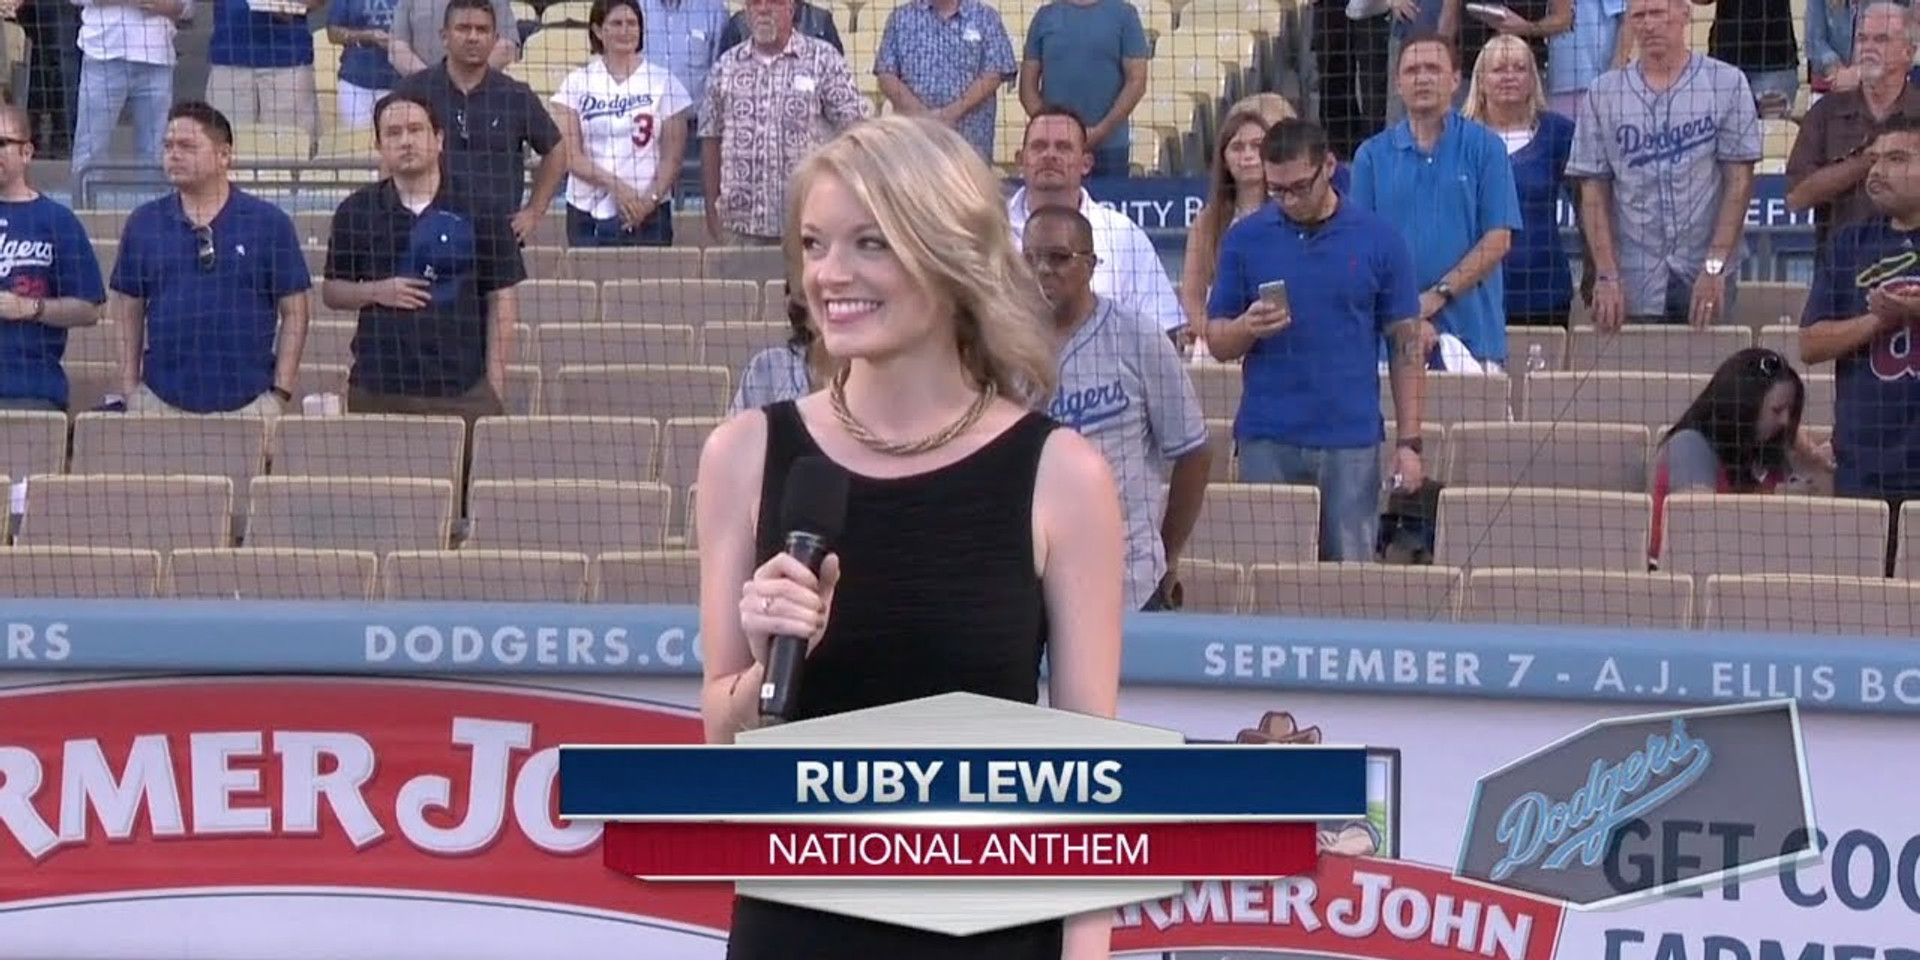 Ruby Lewis at Dodgers Stadium